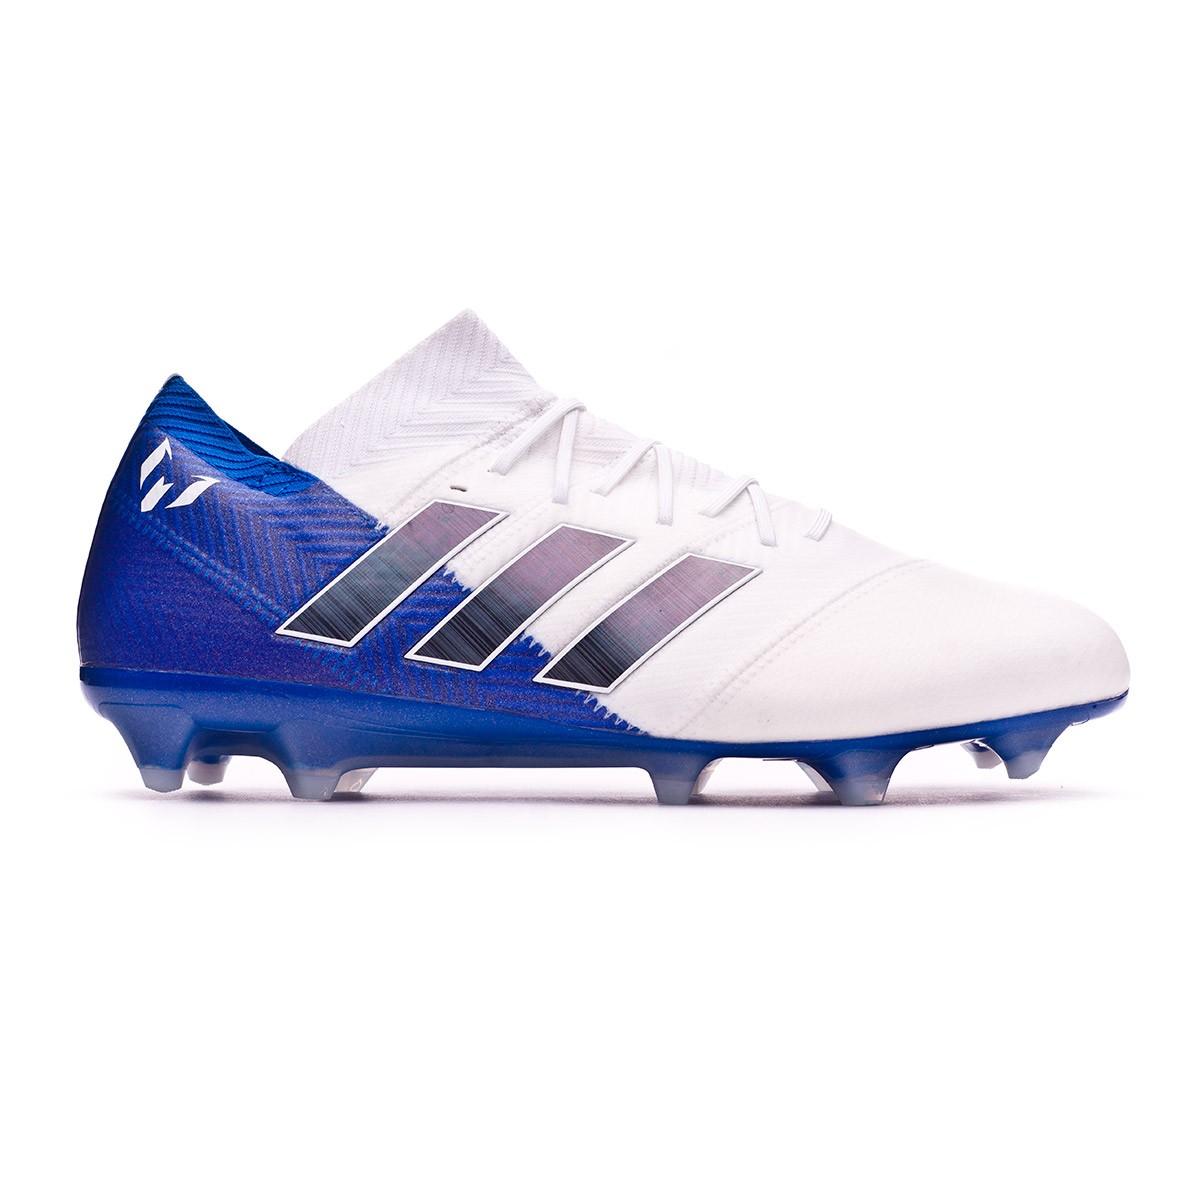 buy online f13da 17d83 Boot adidas Nemeziz Messi 18.1 FG White-Core black-Football blue - Football  store Fútbol Emotion